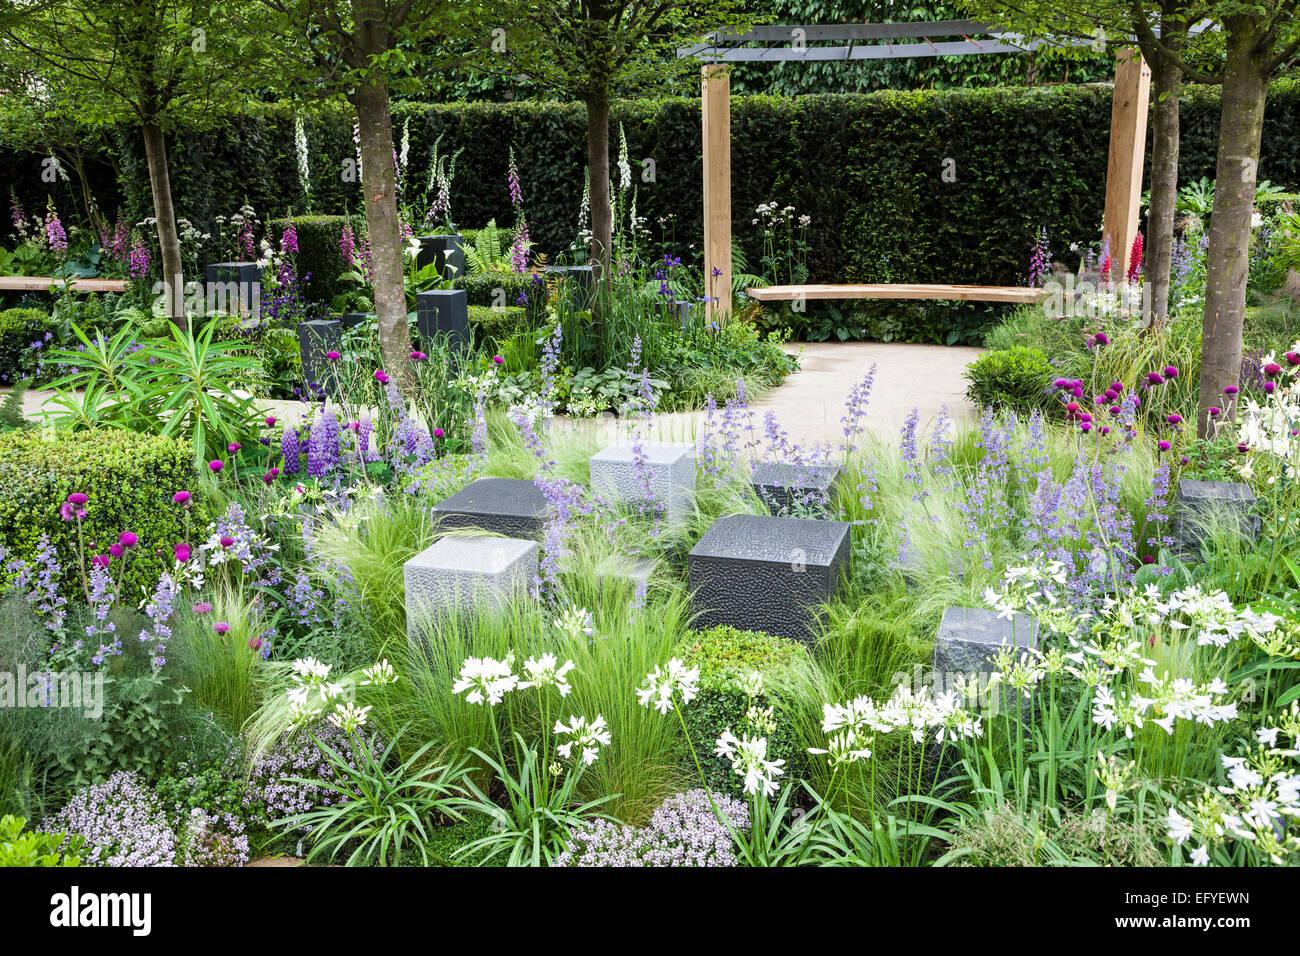 mixed planting stockfotos mixed planting bilder alamy. Black Bedroom Furniture Sets. Home Design Ideas